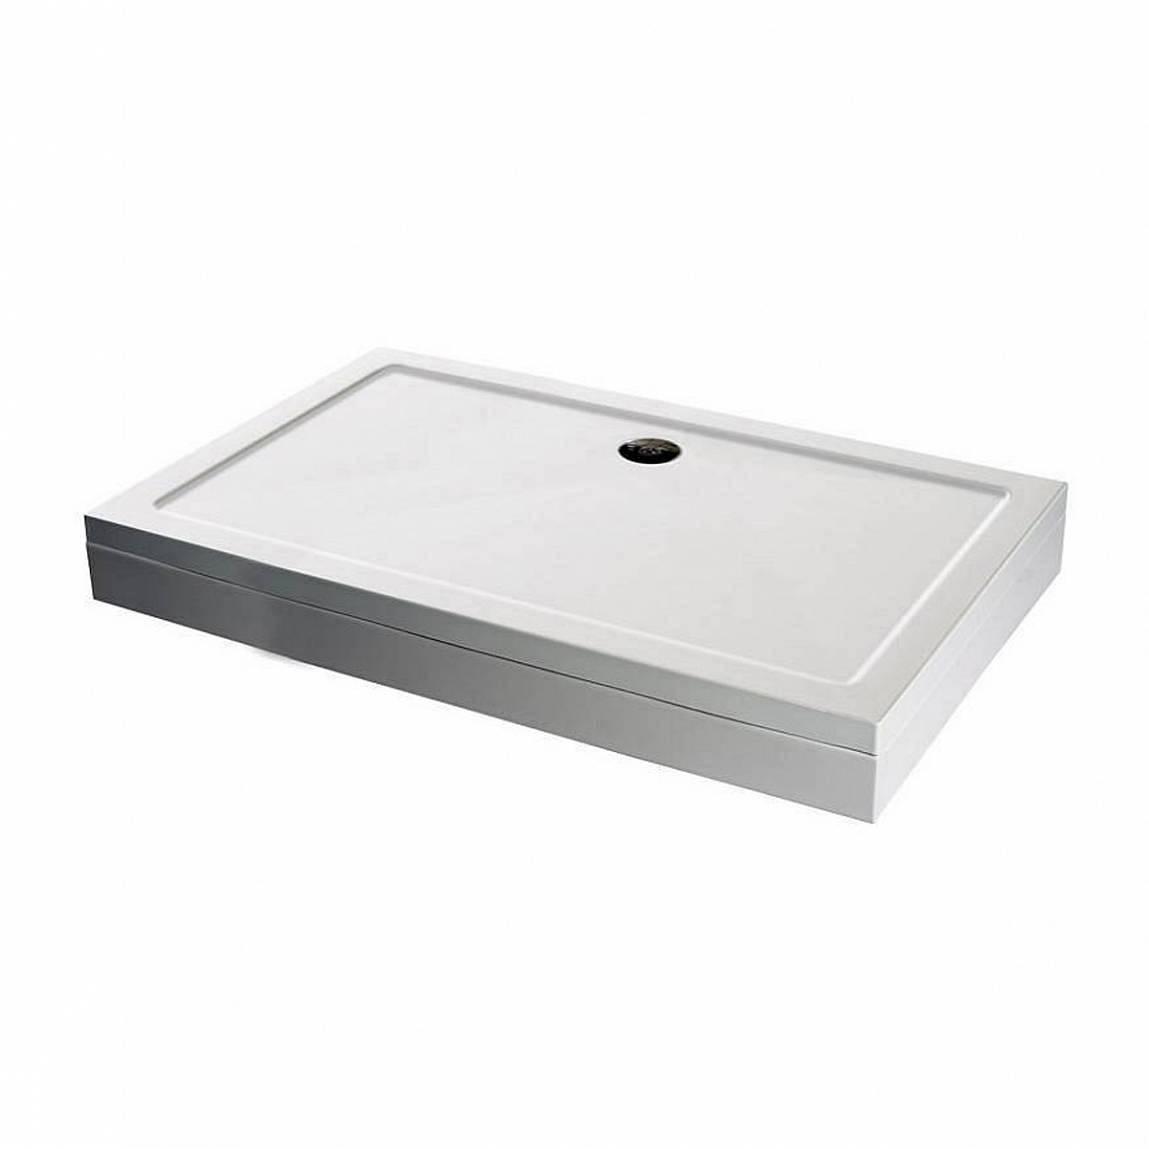 Image of Rectangular Stone Shower Tray & Riser Kit 1000 x 900